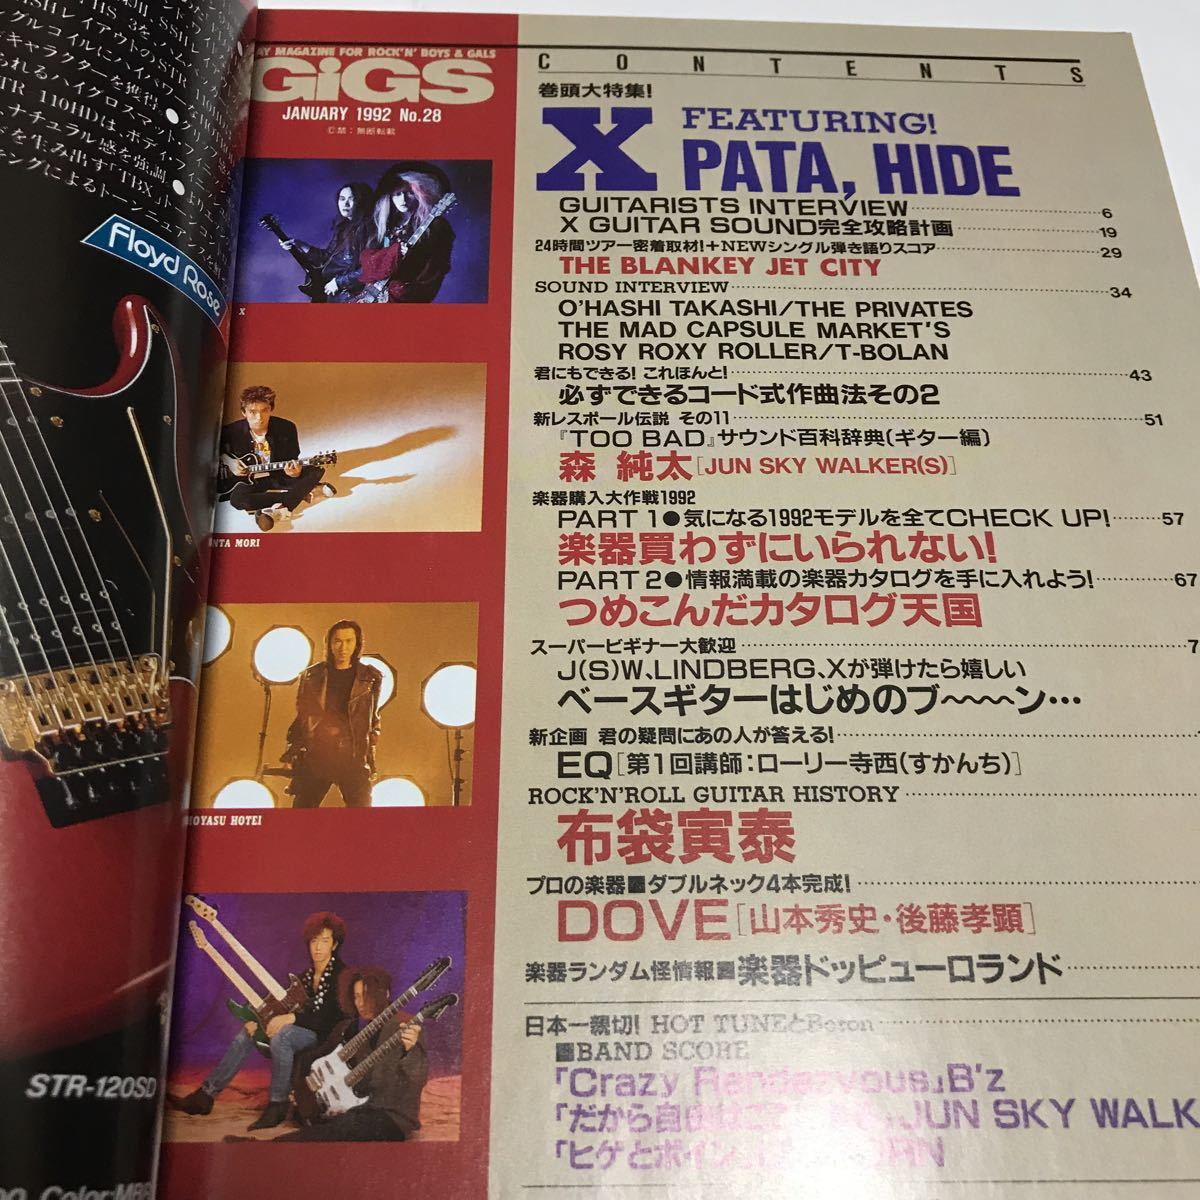 X JAPAN hide PATA表紙 GiGS ギグス 音楽雑誌 YOSHIKI TAIJI Toshl HEATH xjapan エックス ジャパメタ 布袋寅泰 森 純太 ヴィジュアル系_画像5